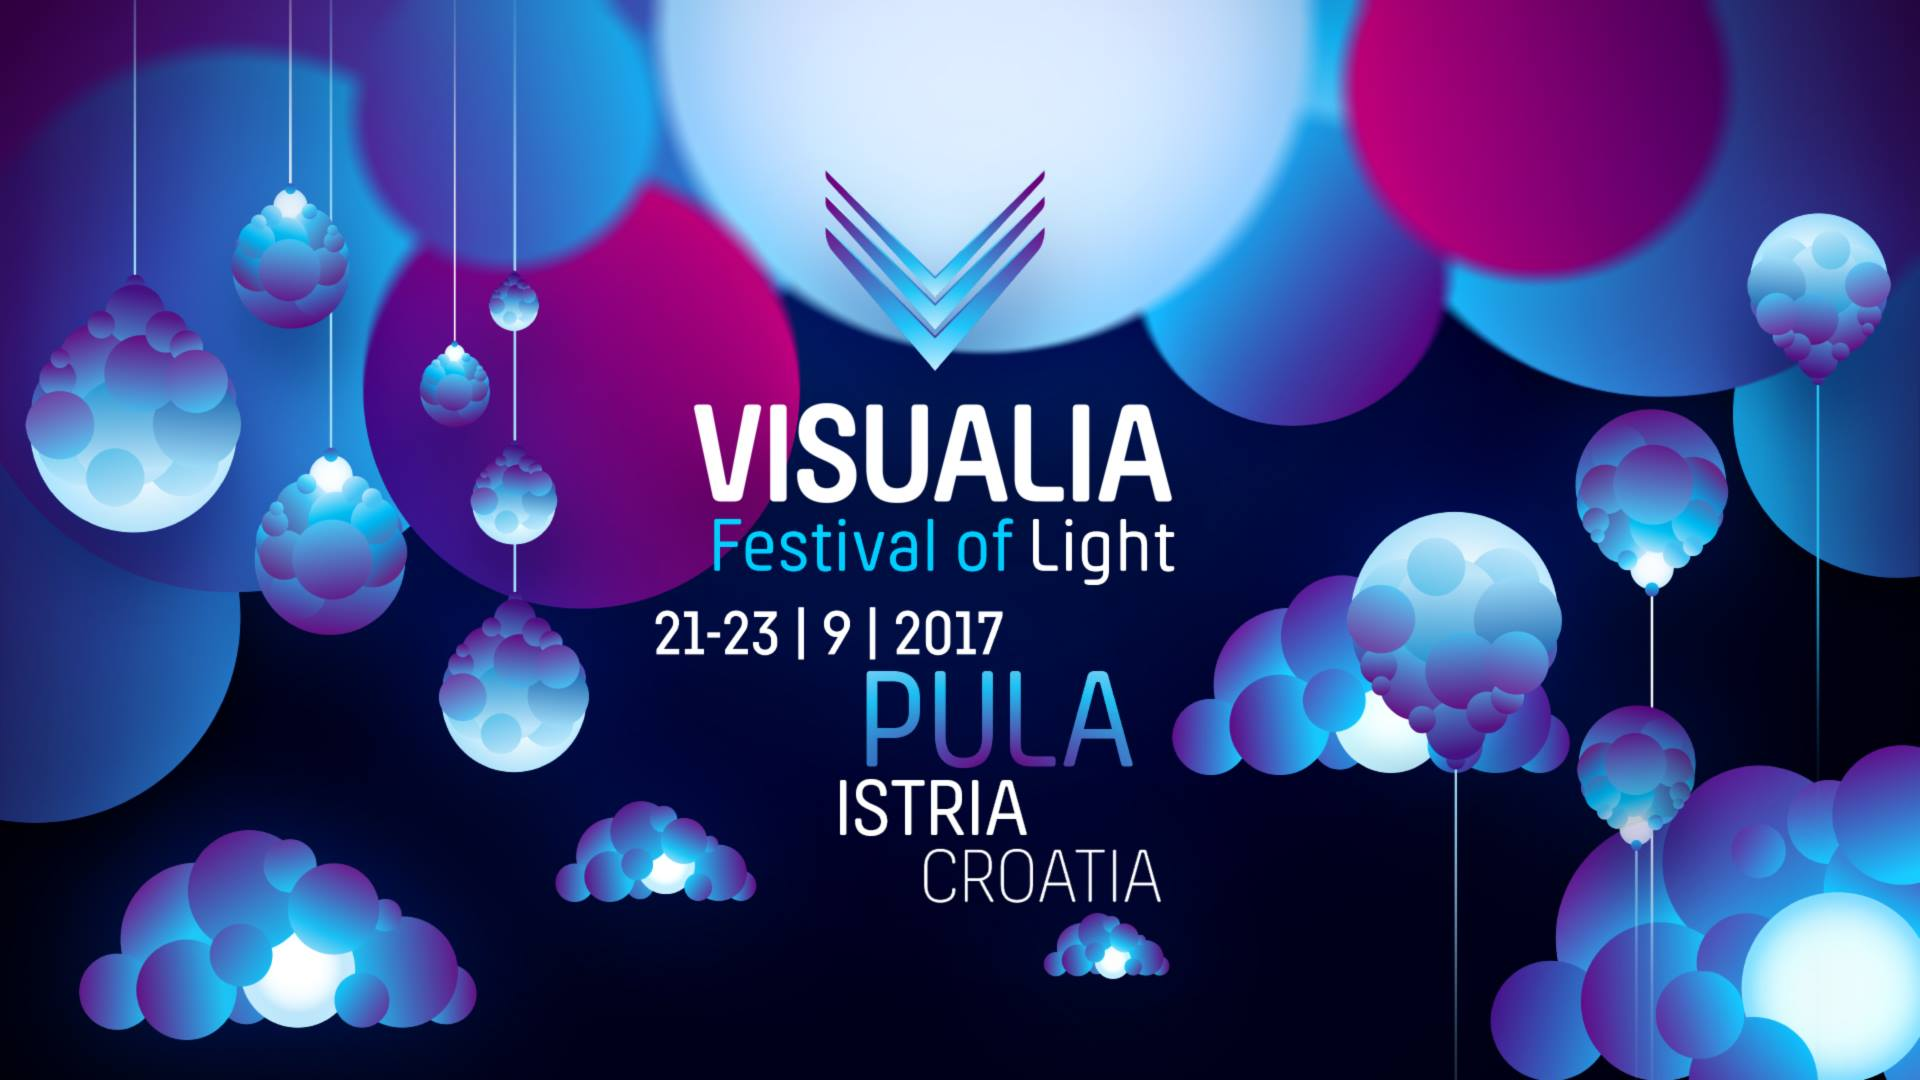 Visualia Event. eng, jpg